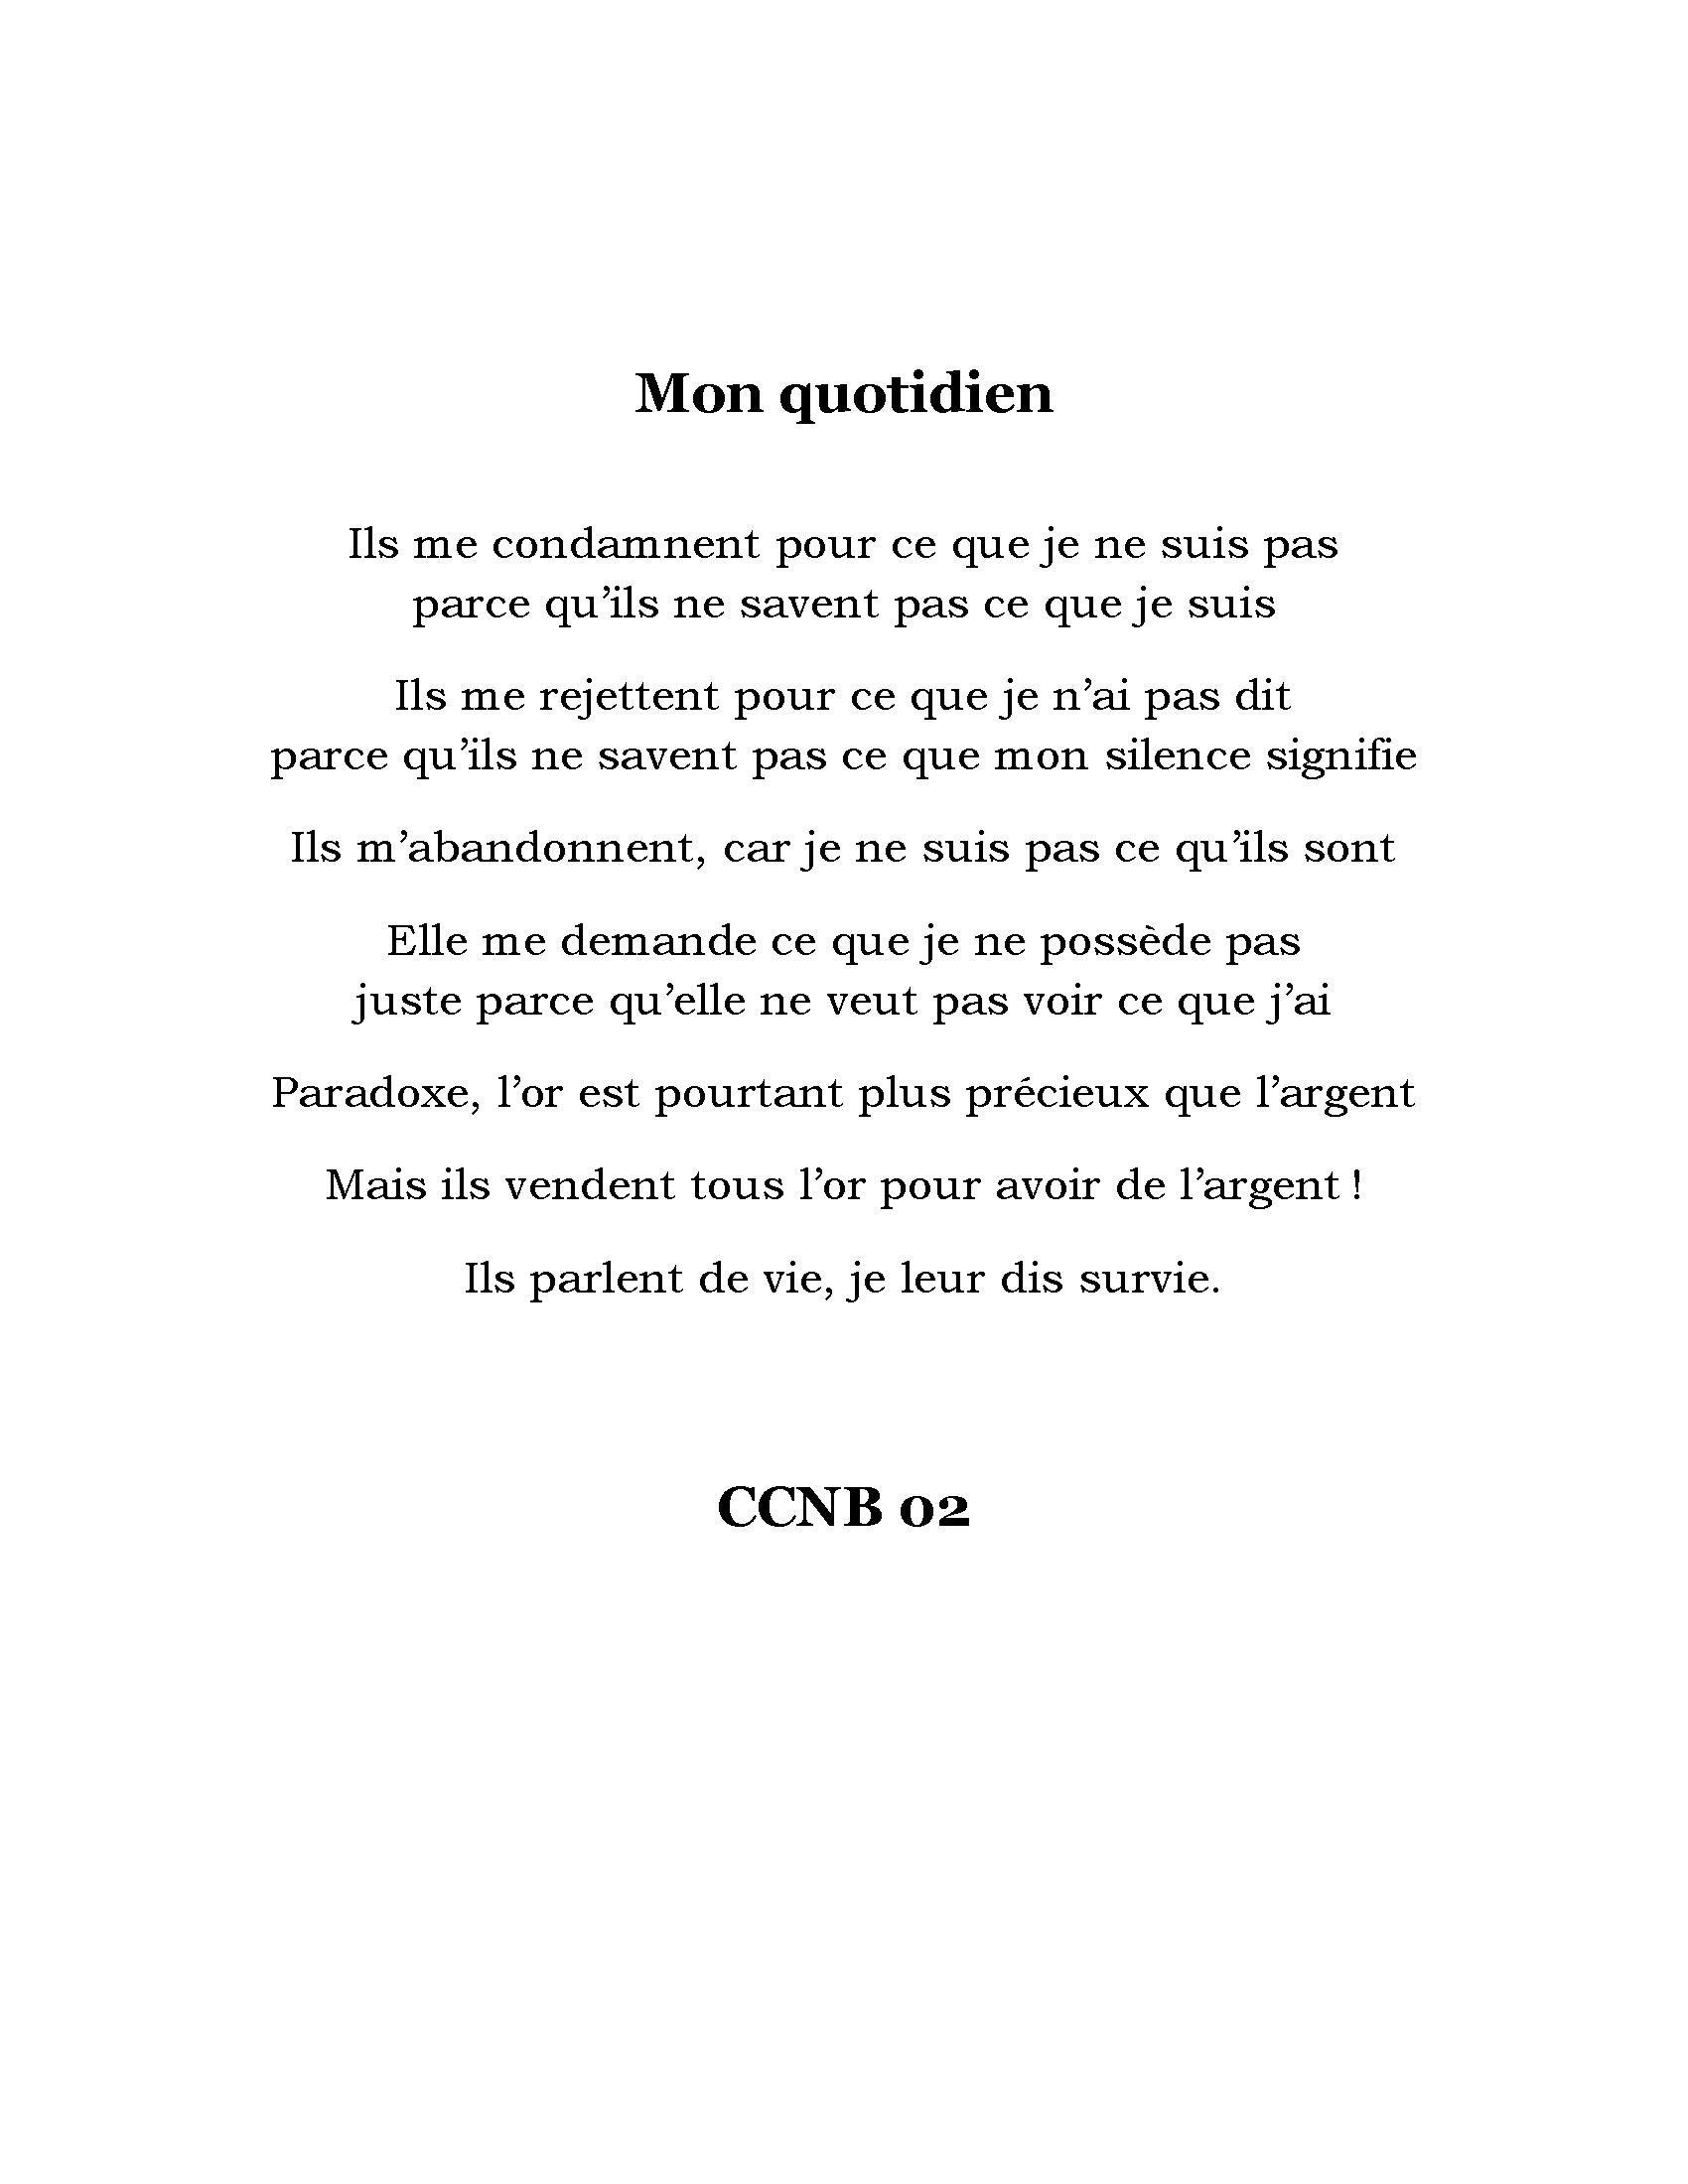 CCNB 02